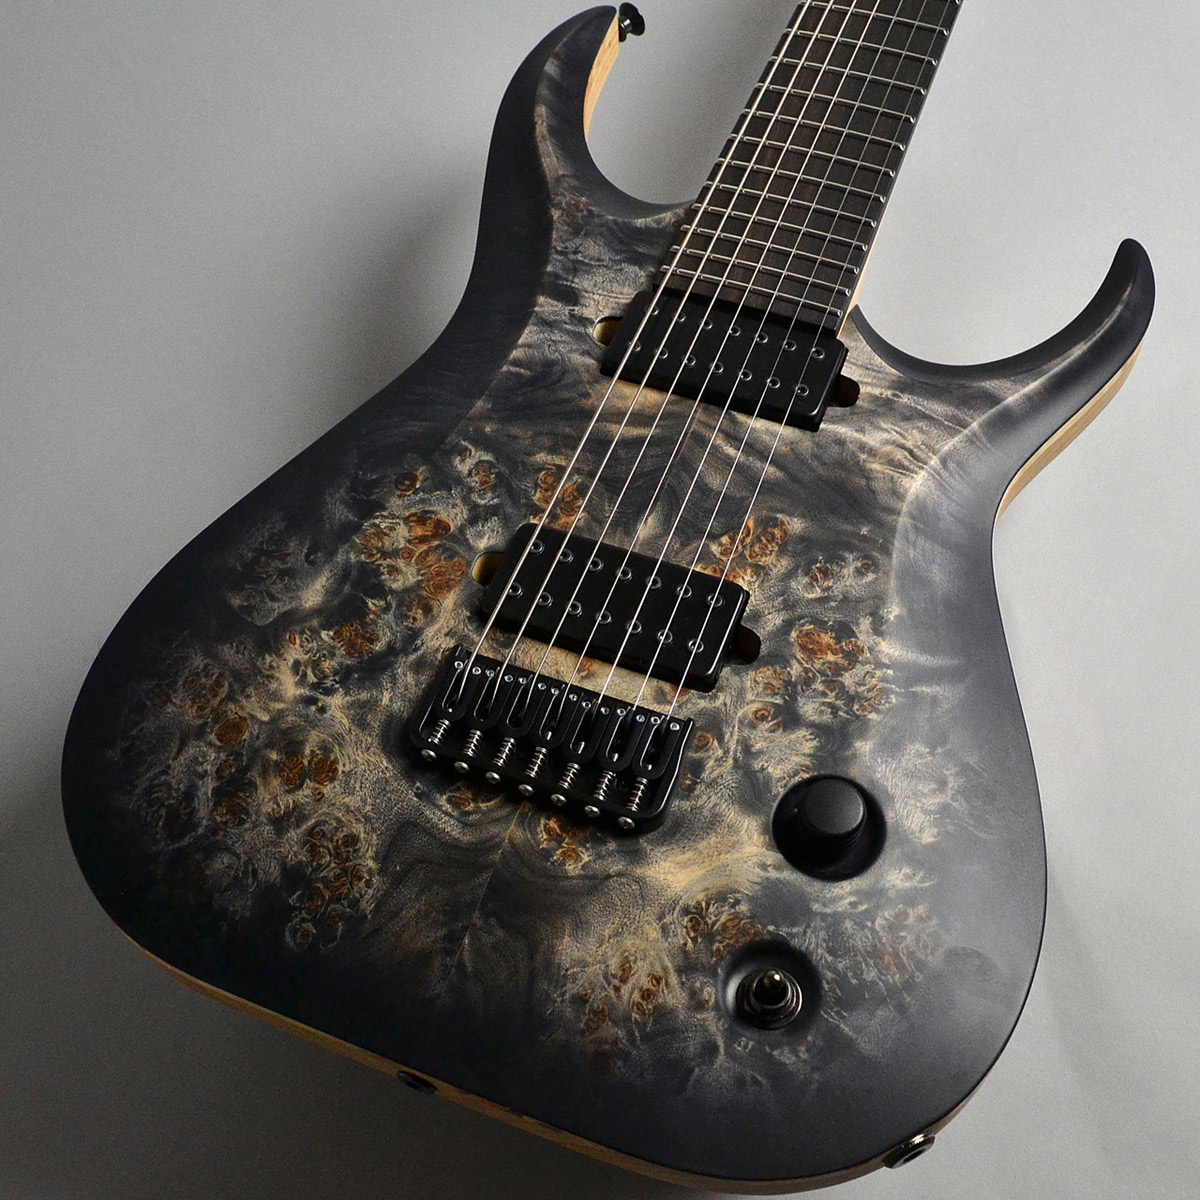 SKERVESEN GUITARS Raptor 7 Poplar Burl Curved Top Black Burst Graphite 7弦ギター 【スケルヴェセン ギターズ】【新宿PePe店】